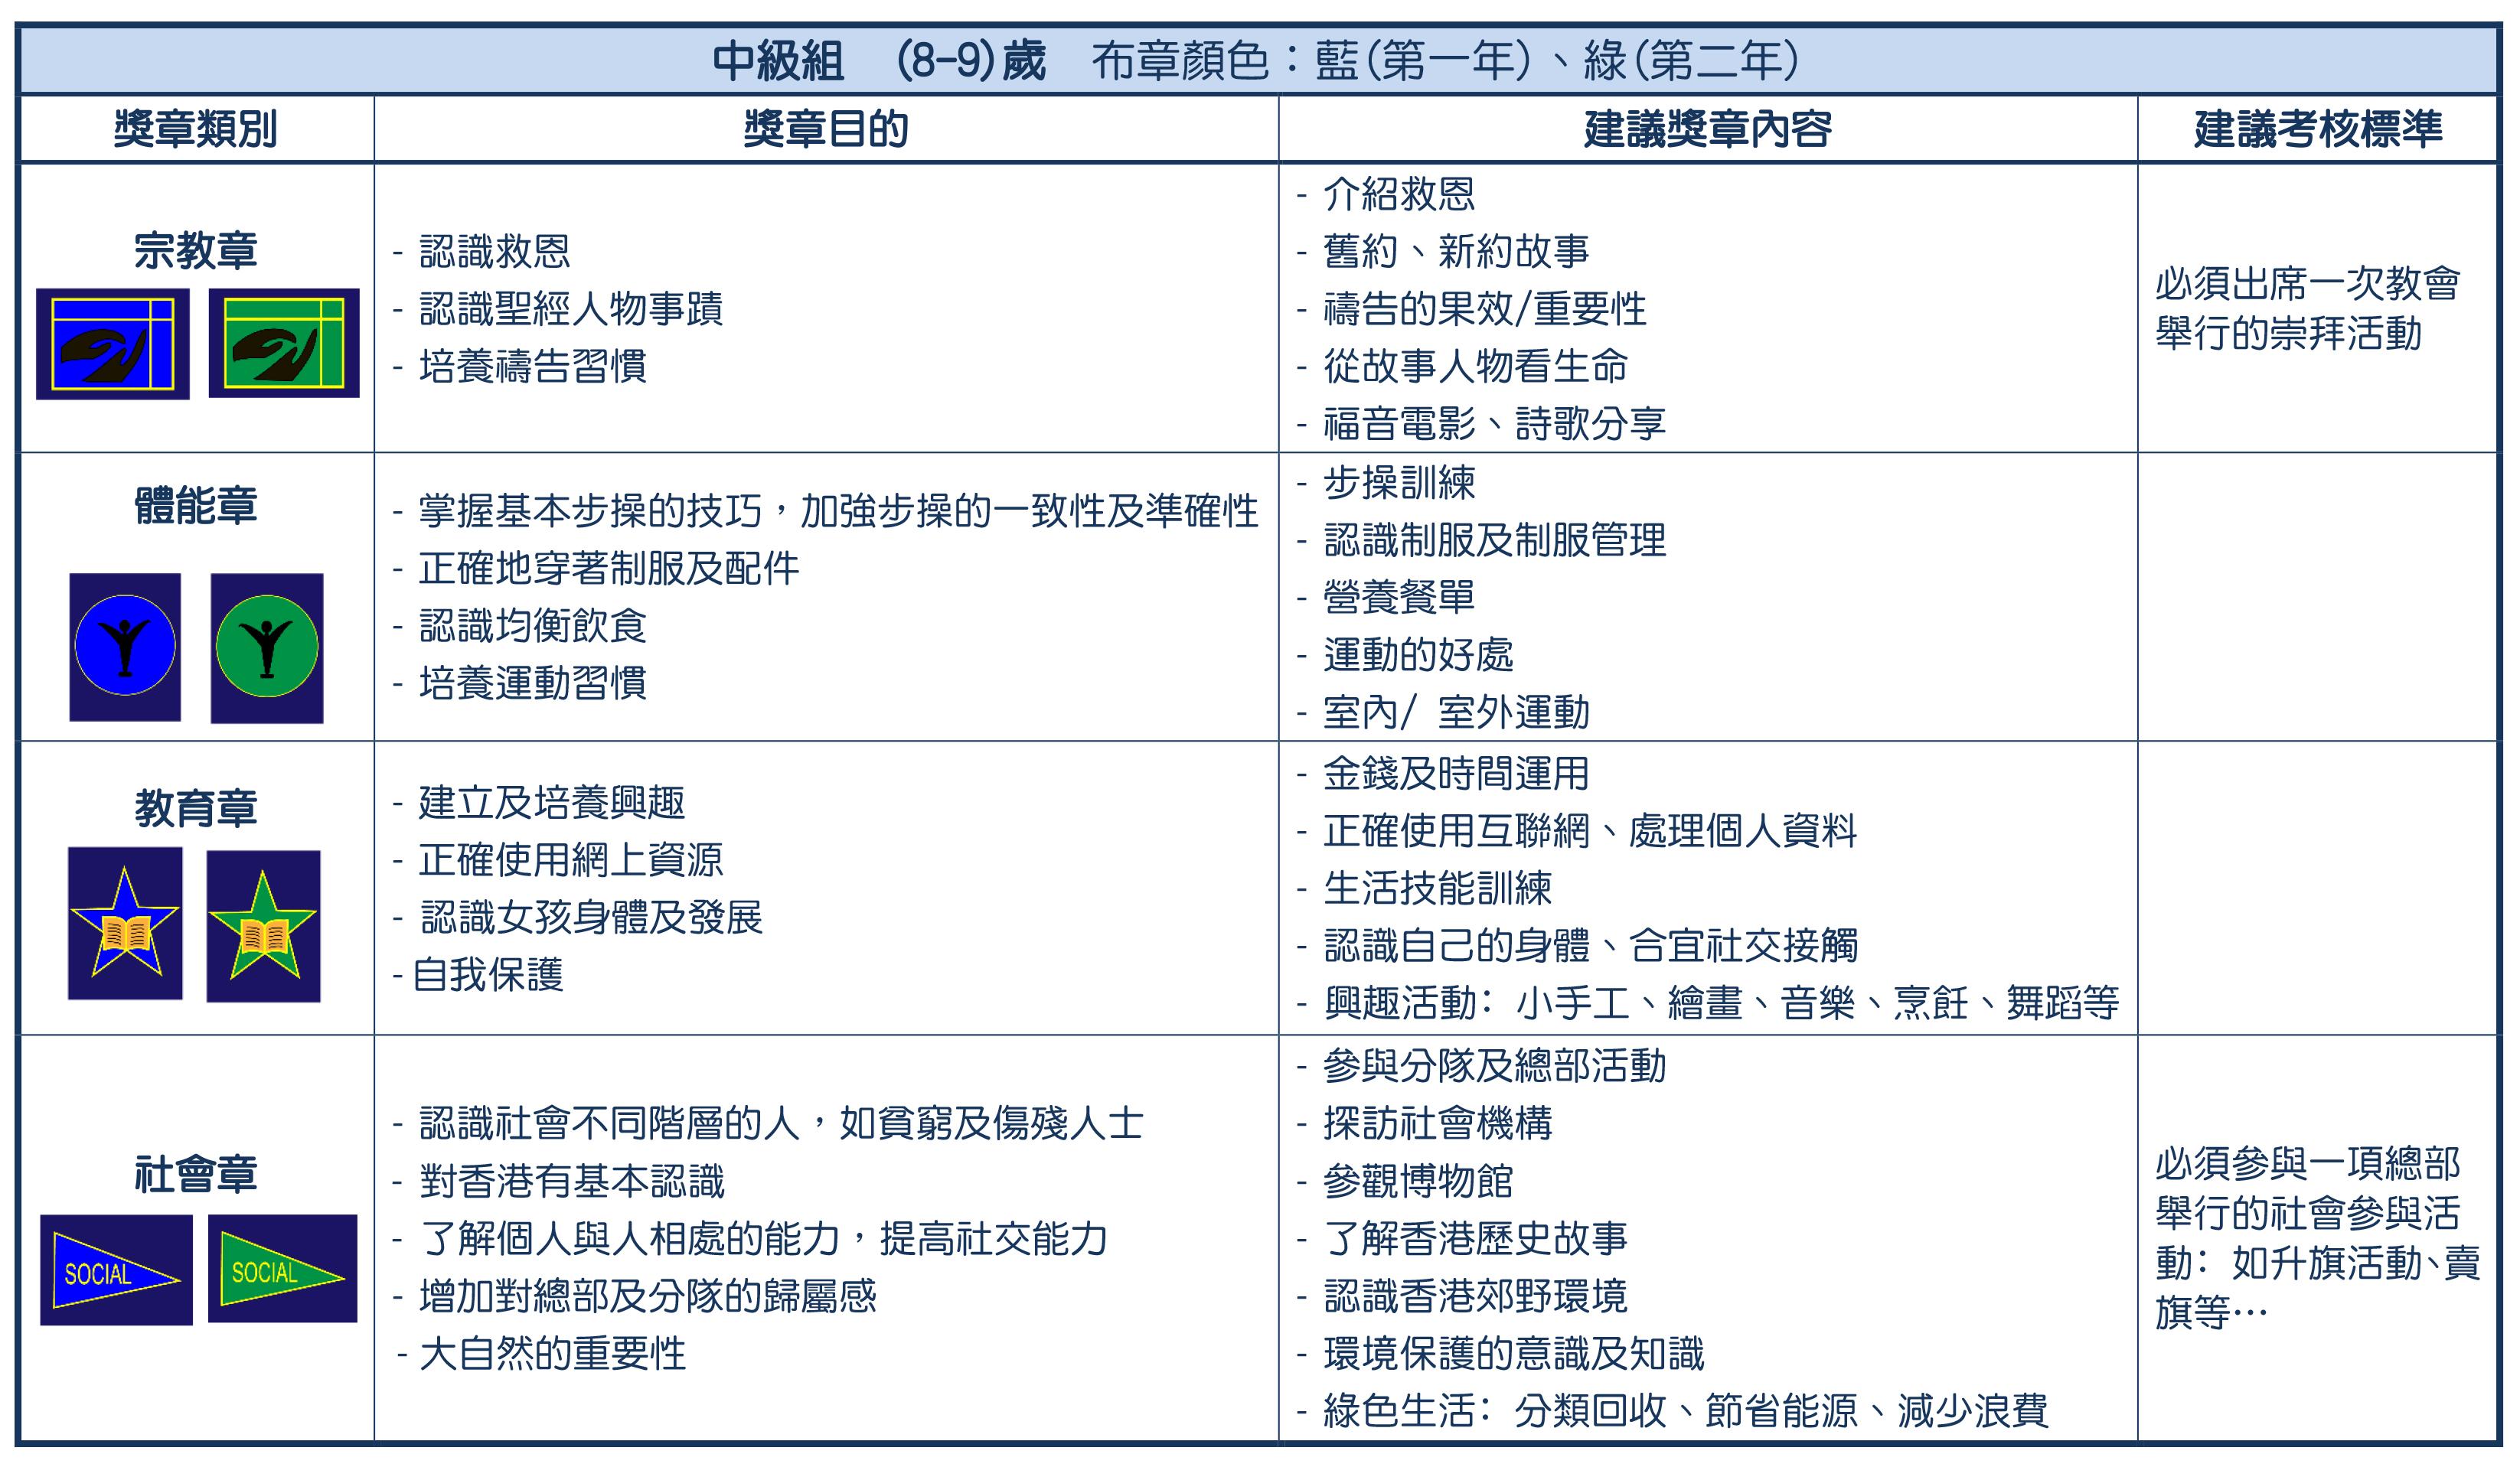 6- 獎章制度-中級組(revised 2020829)